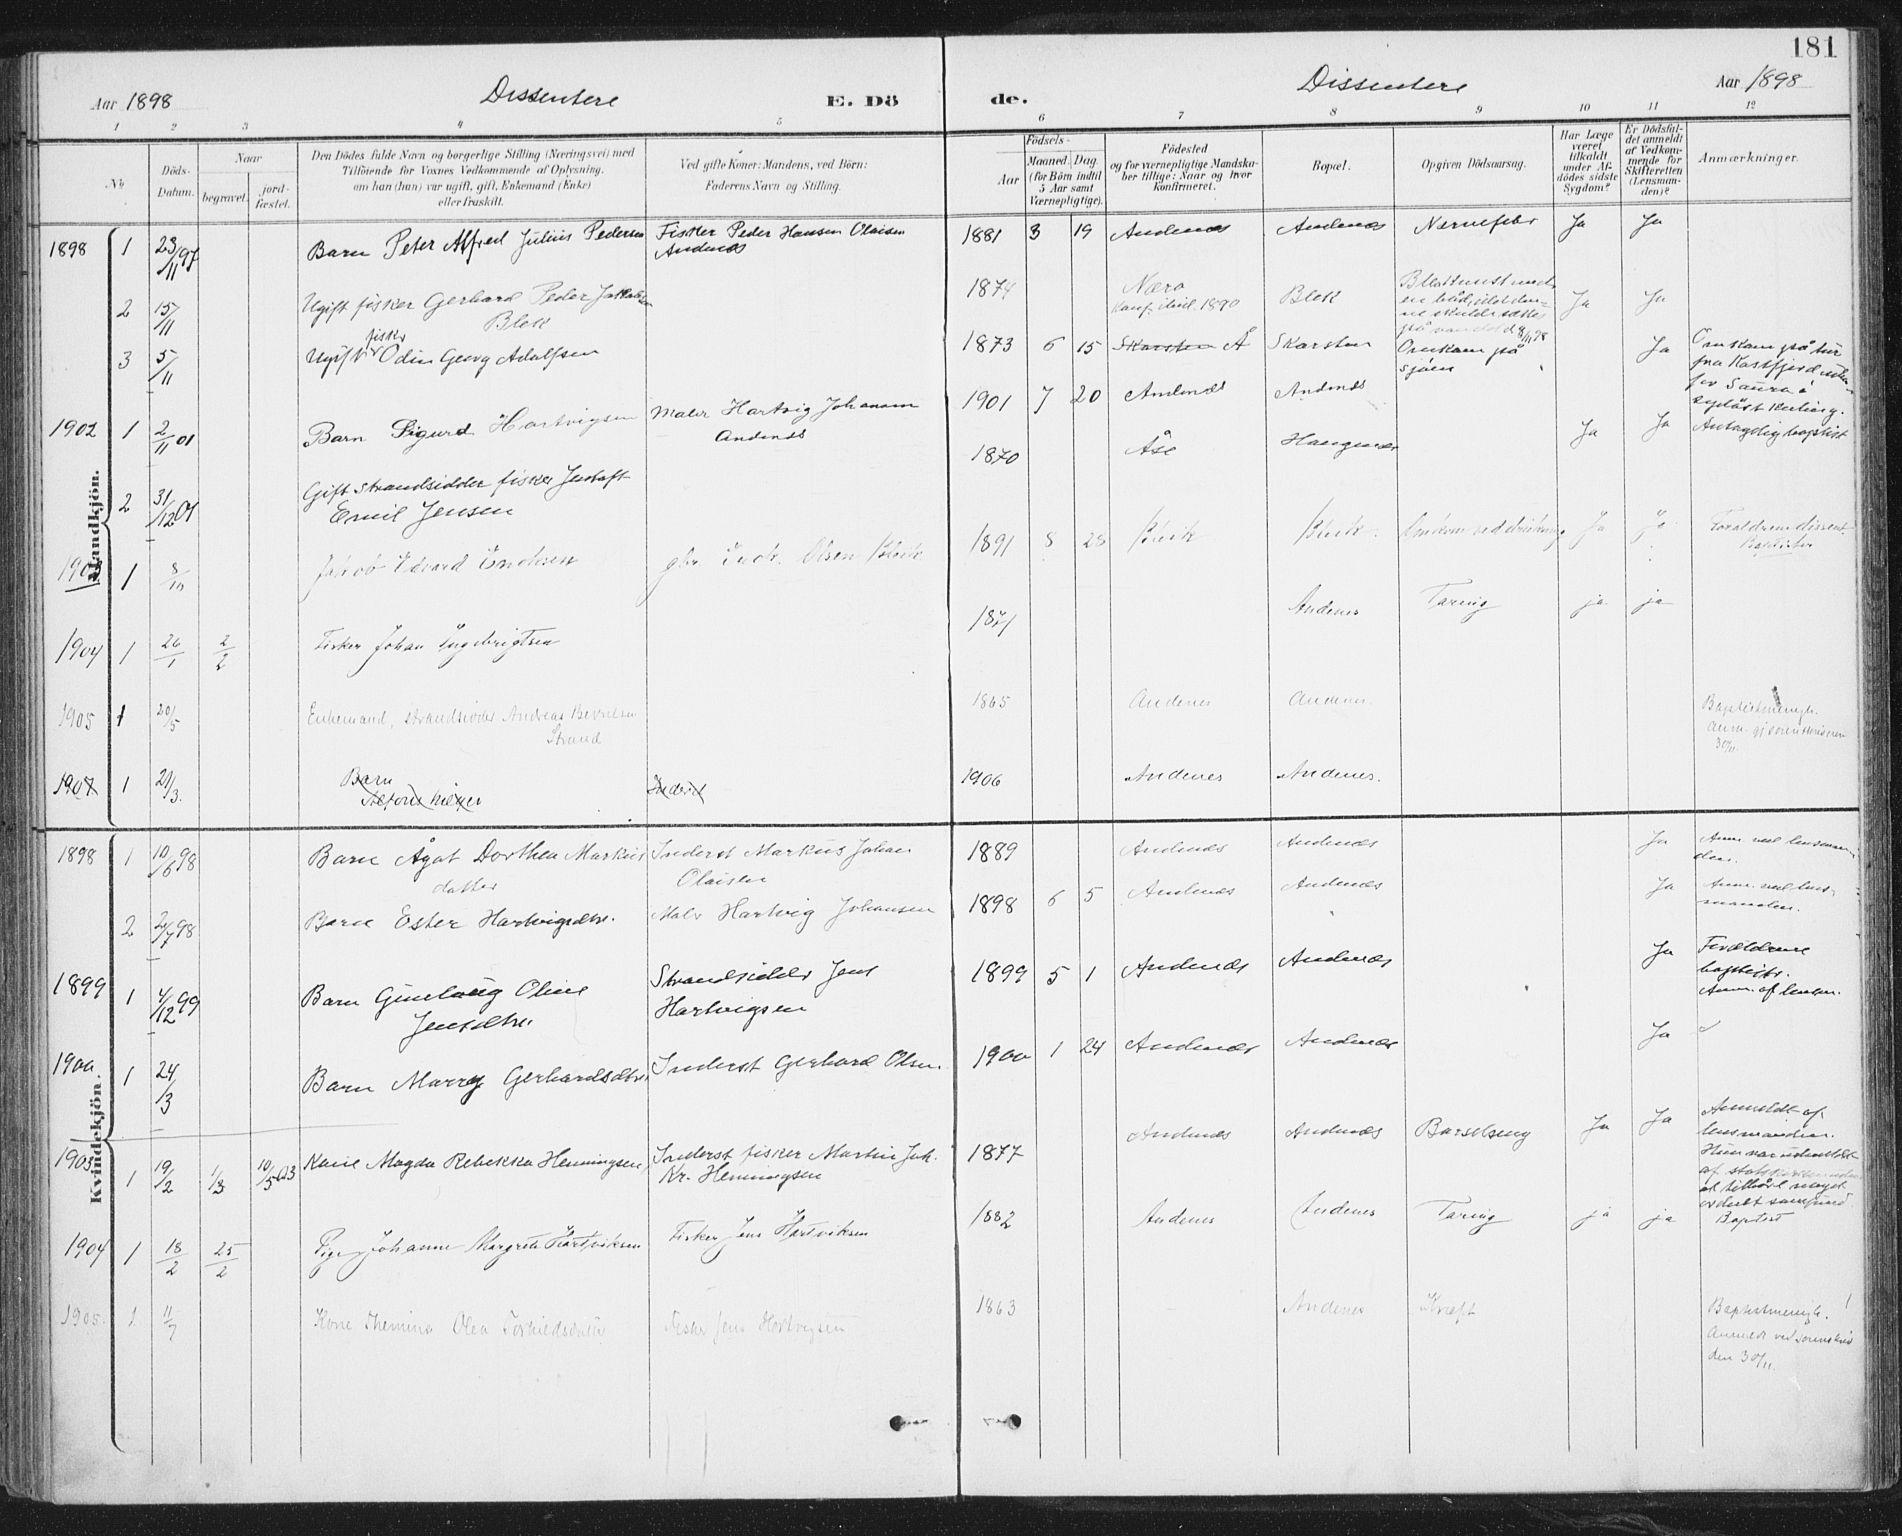 SAT, Ministerialprotokoller, klokkerbøker og fødselsregistre - Nordland, 899/L1437: Ministerialbok nr. 899A05, 1897-1908, s. 181